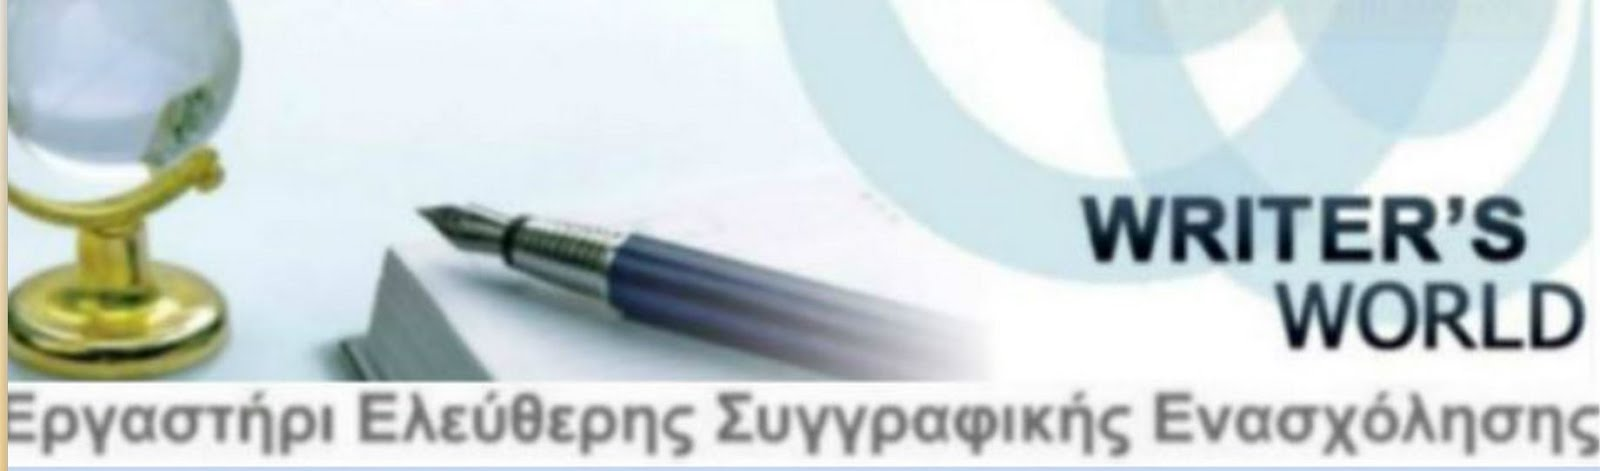 syggrafeas